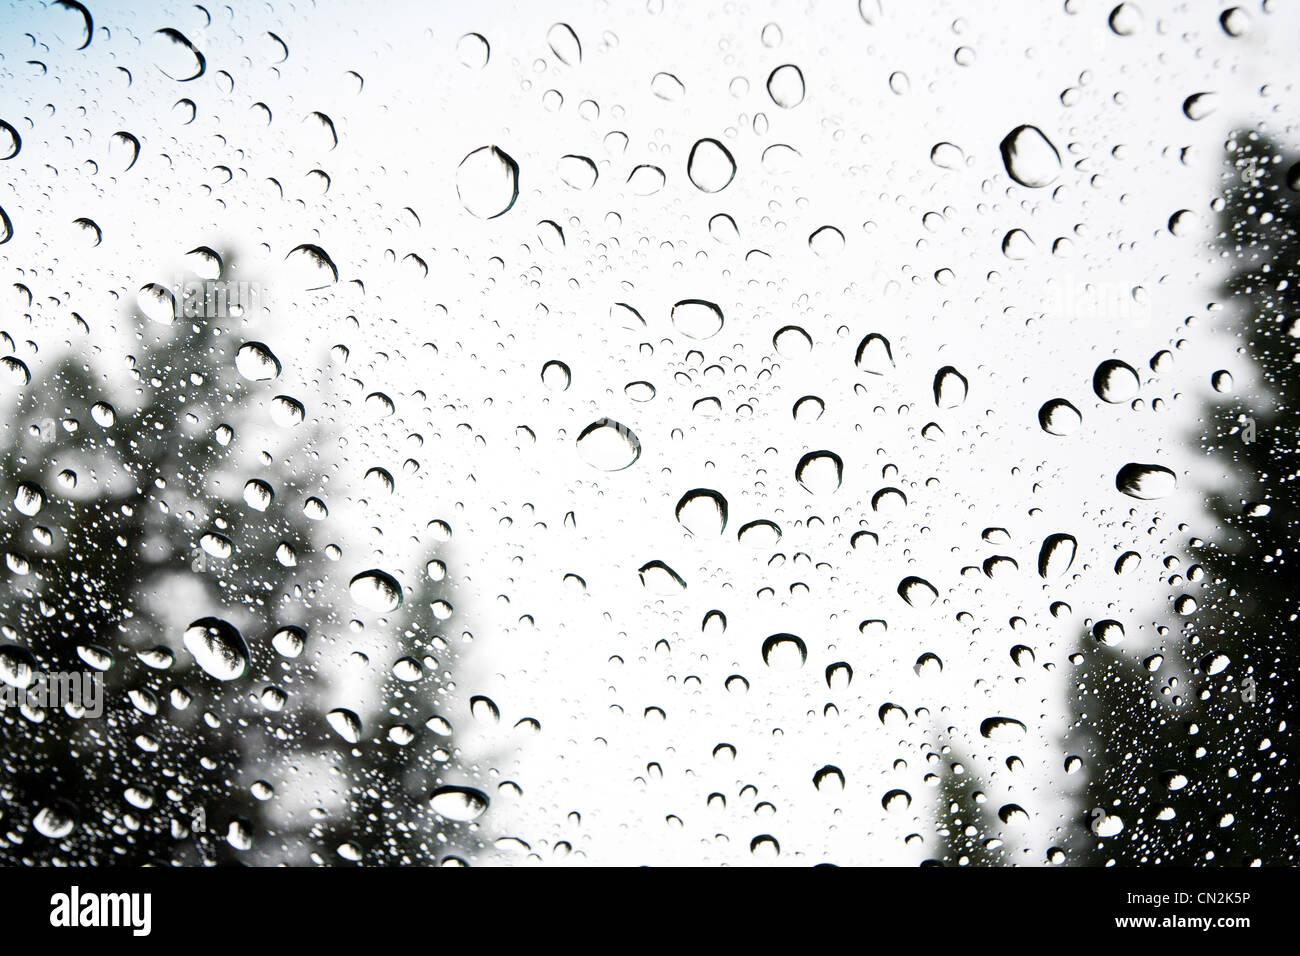 Raindrops on Window - Stock Image